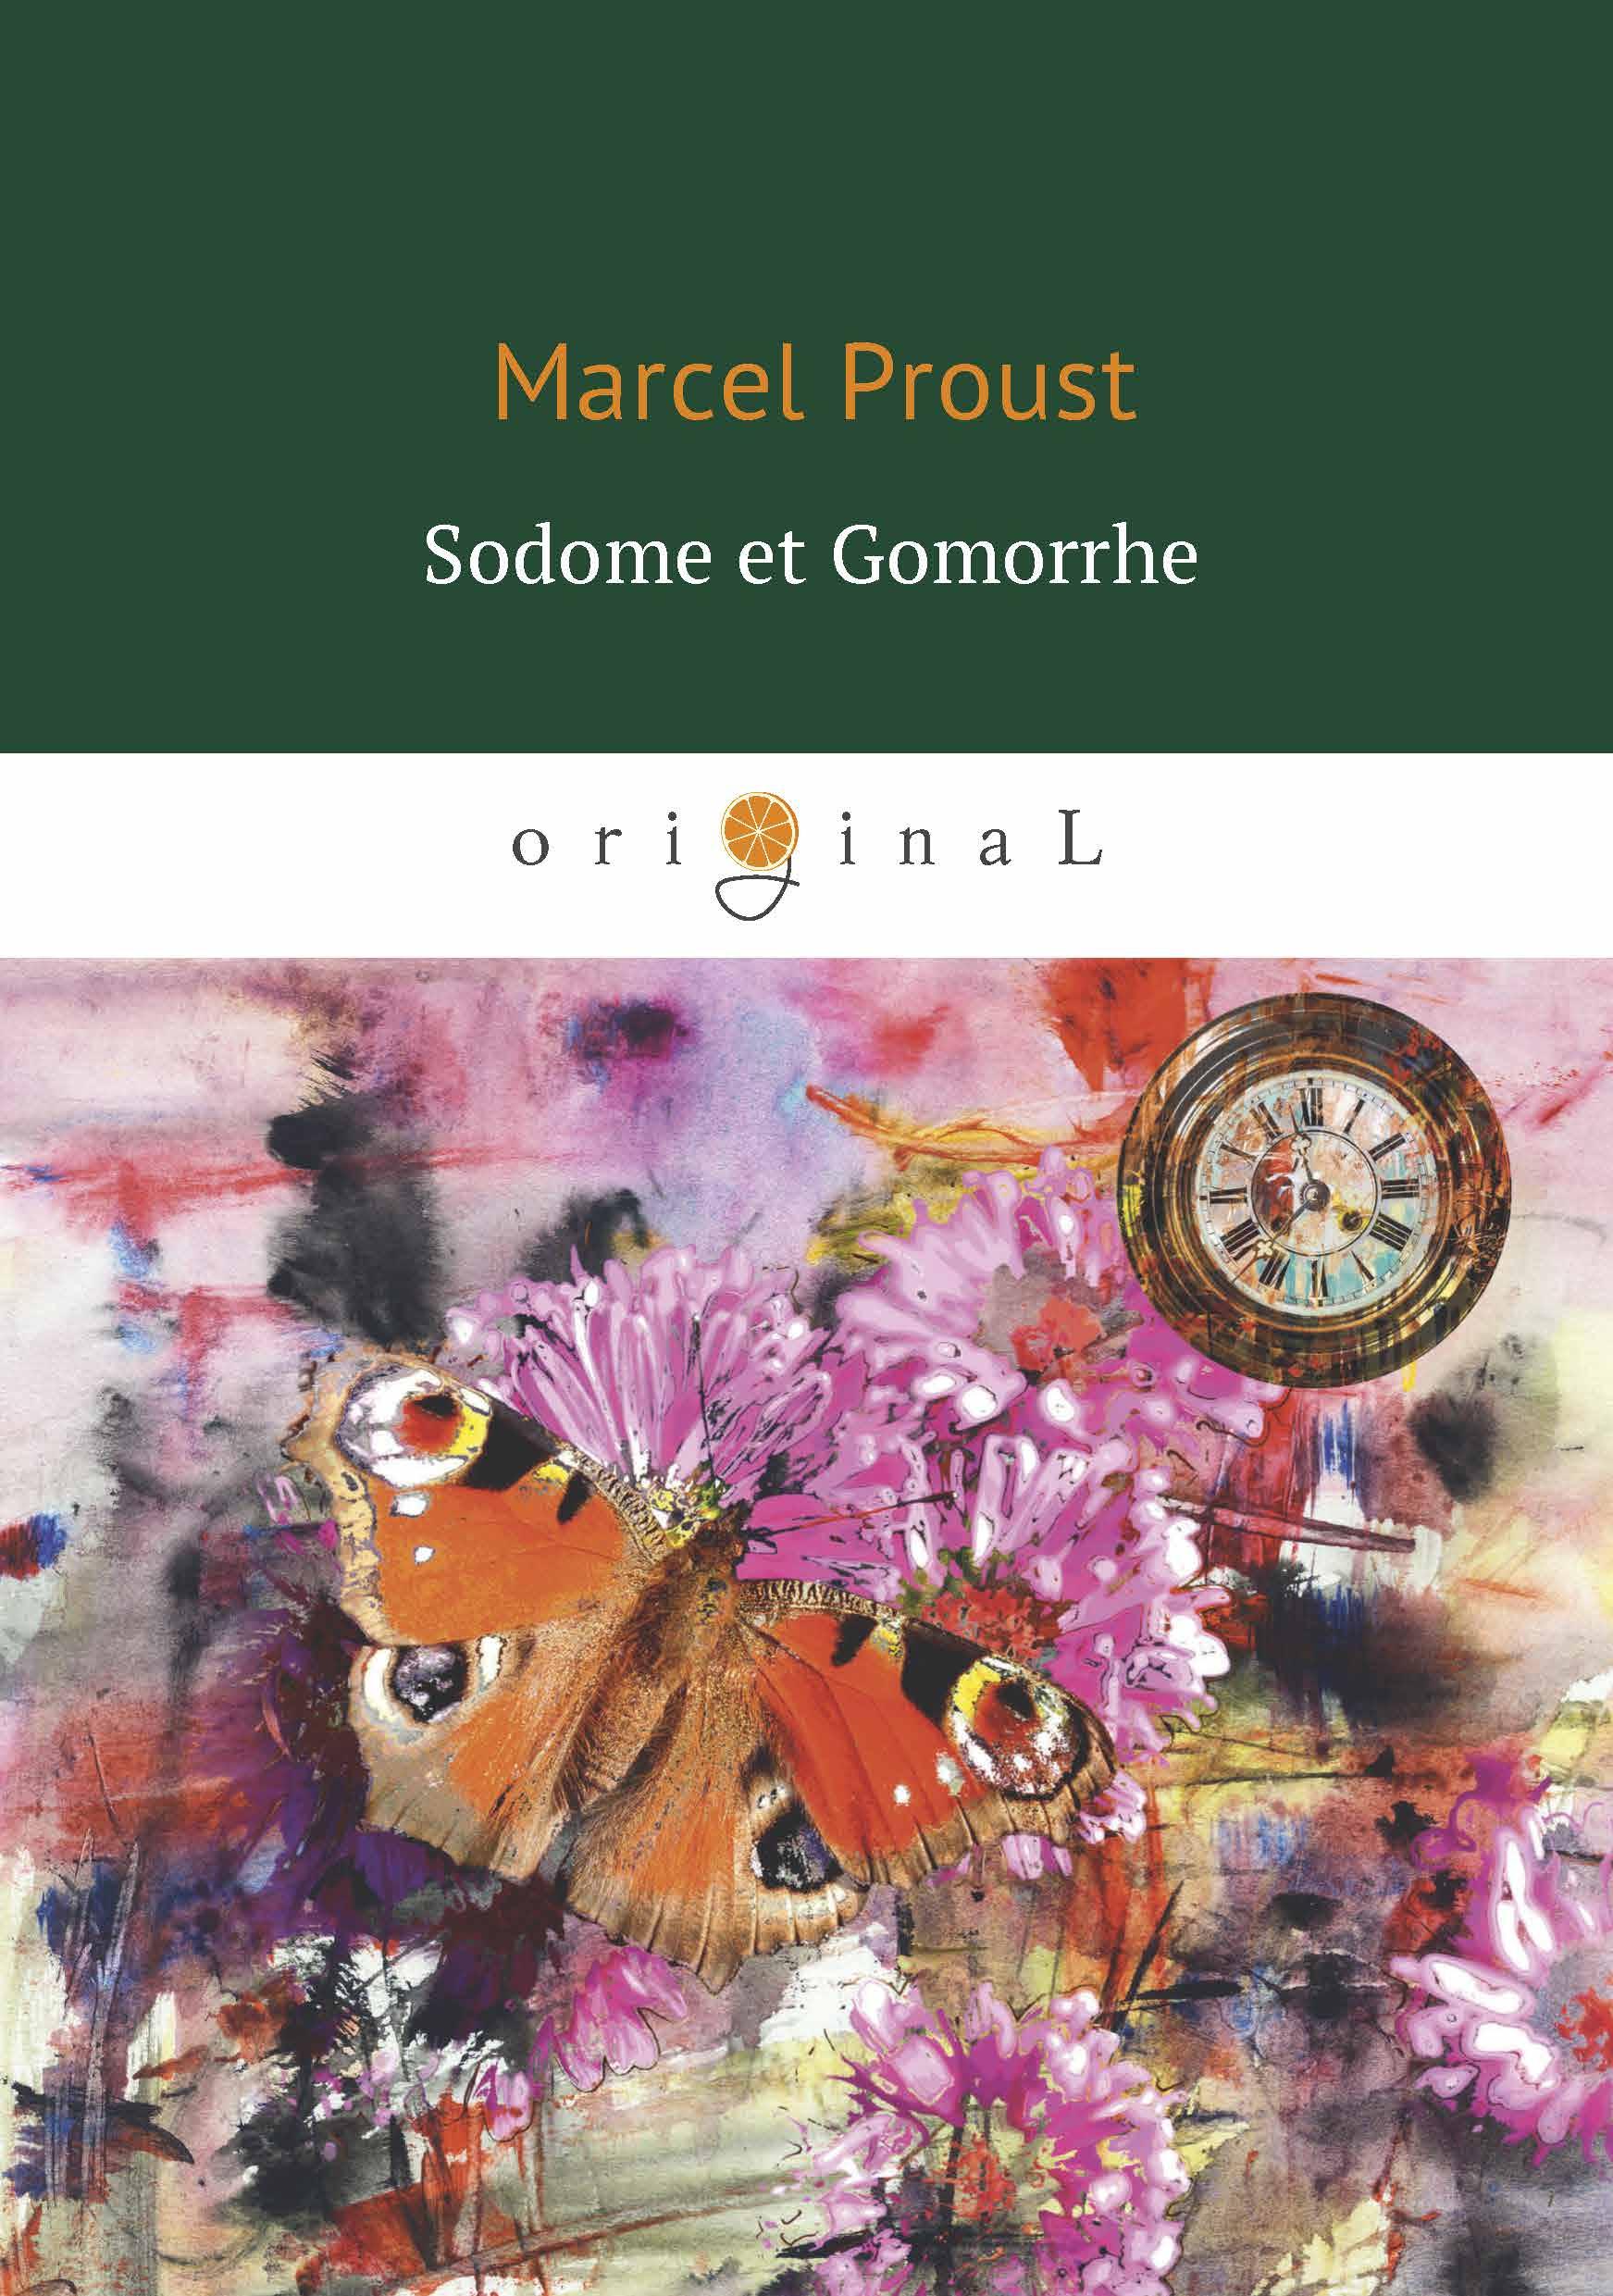 Marcel Proust Sodome et Gomorrhe (Содом и Гоморра) fashion cool punk style pendant necklace 1922 dual plate theme